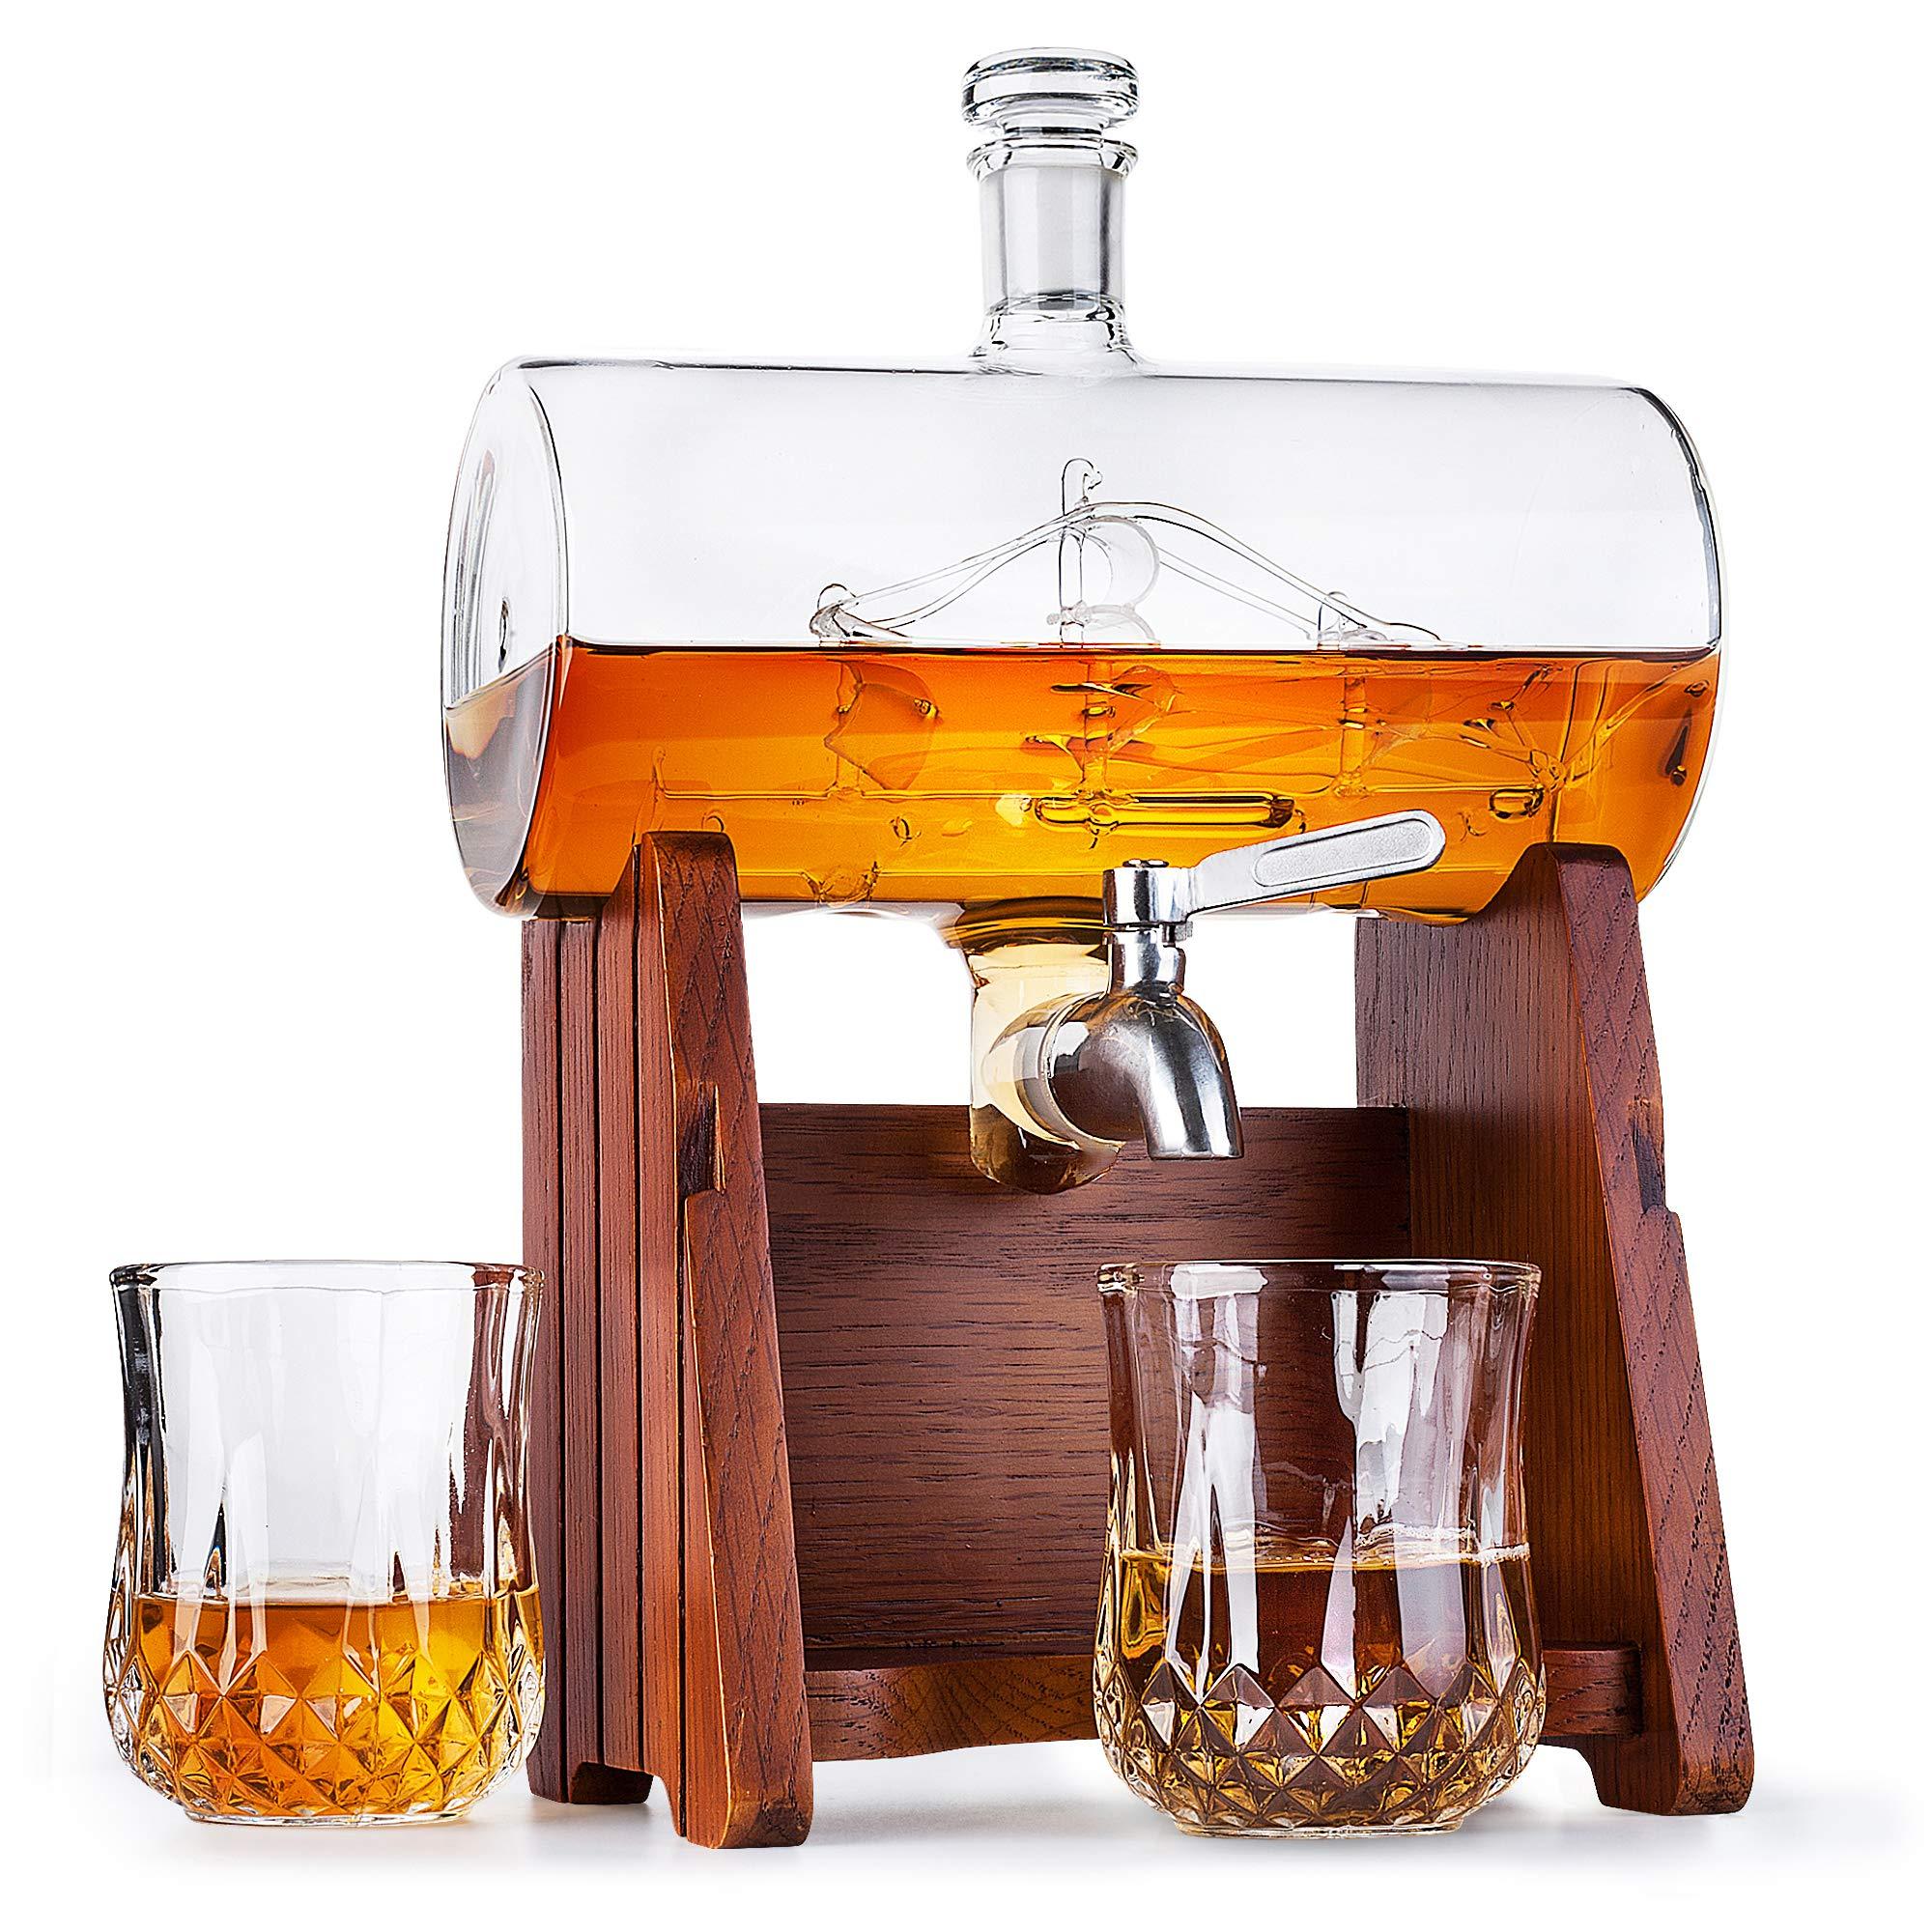 Milburga Unique Whiskey Decanter Set – Sailing Ship Decanter with 2 Lead Free Scotch Glasses and Oak Stand – 1150ml Vintage Liquor Dispenser, Elegant Bourbon Gift Set for Scotch, Whisky, Rum & Alcohol